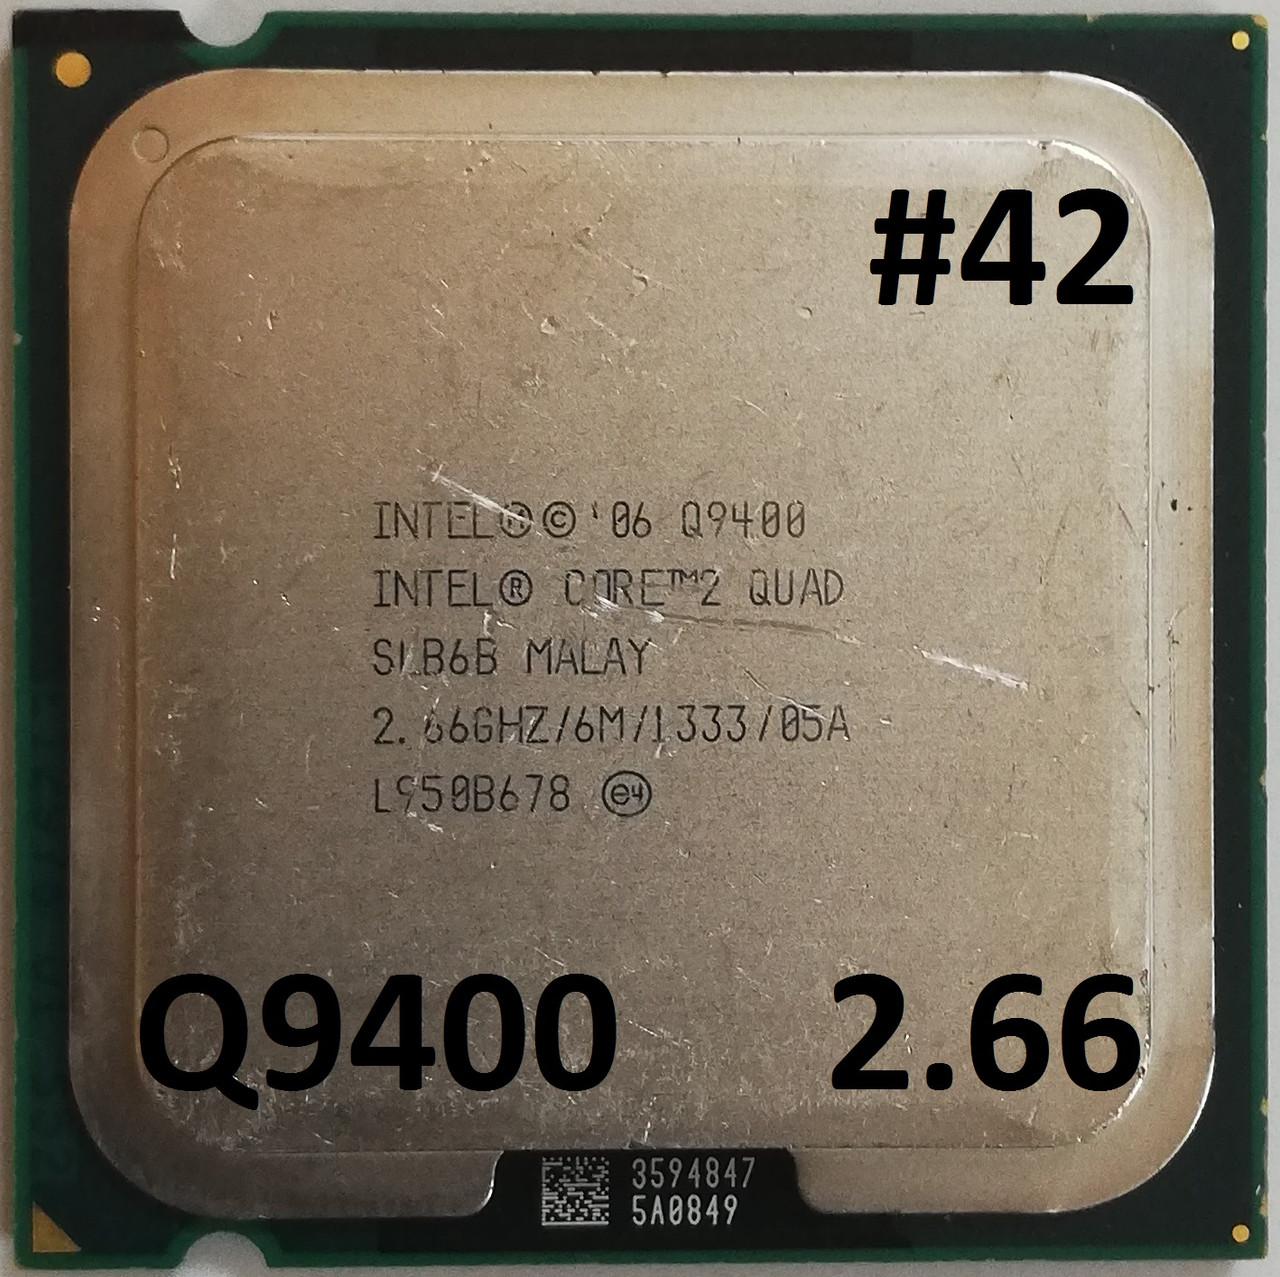 Процессор  ЛОТ #42 Intel® Core™2 Quad Q9400 R0 SLB6B 2.66GHz 6M Cache 1333 MHz FSB Soket 775 Б/У